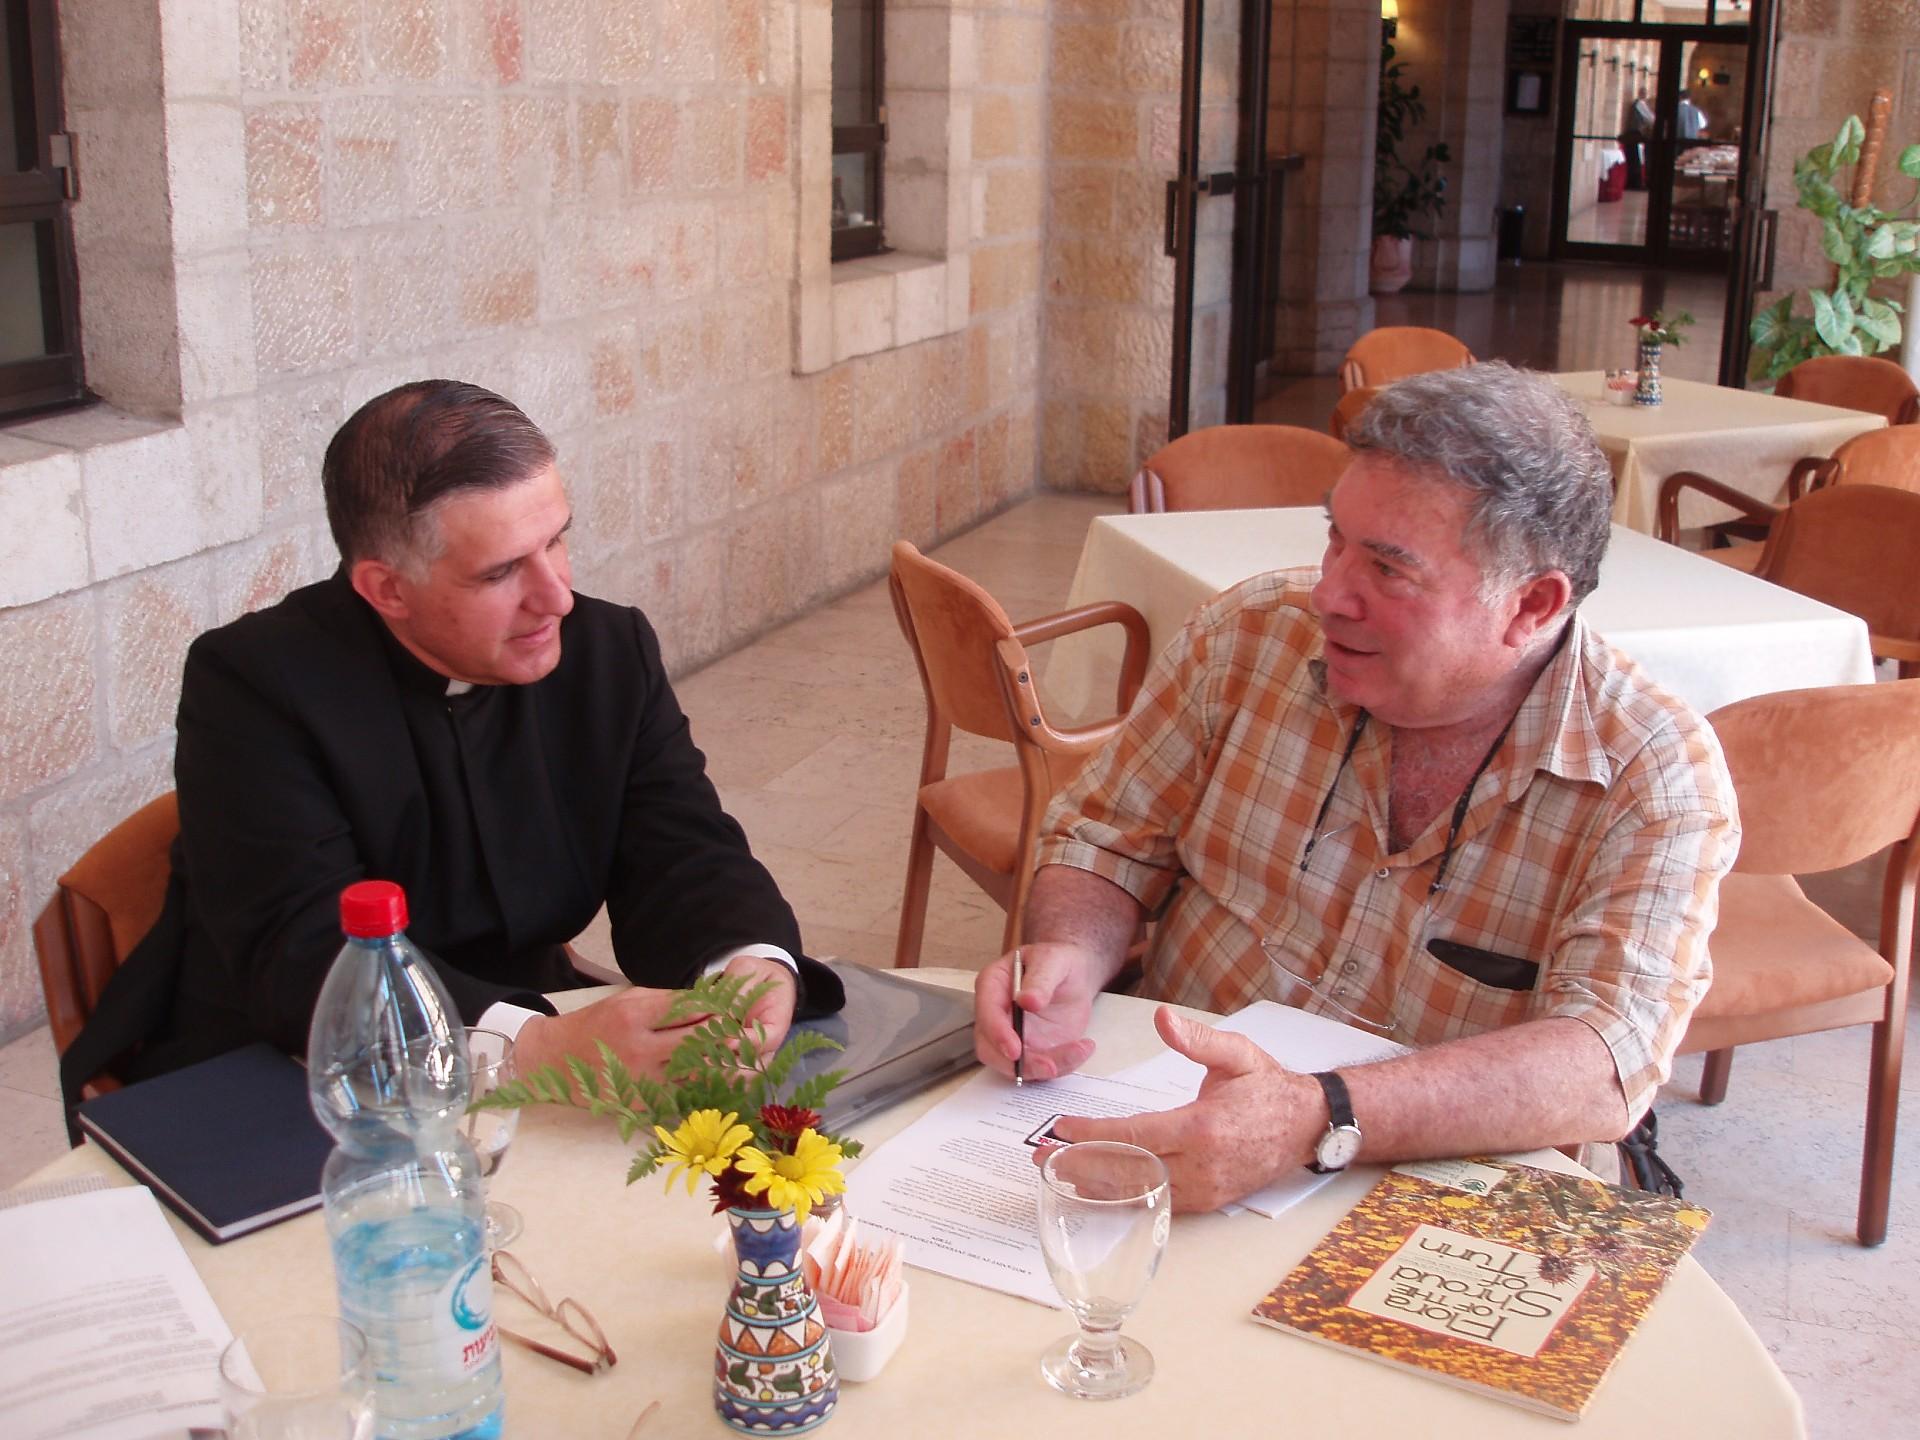 Father Hector Guerra and Botanist Avinoam Danin in The Notre Dame Center